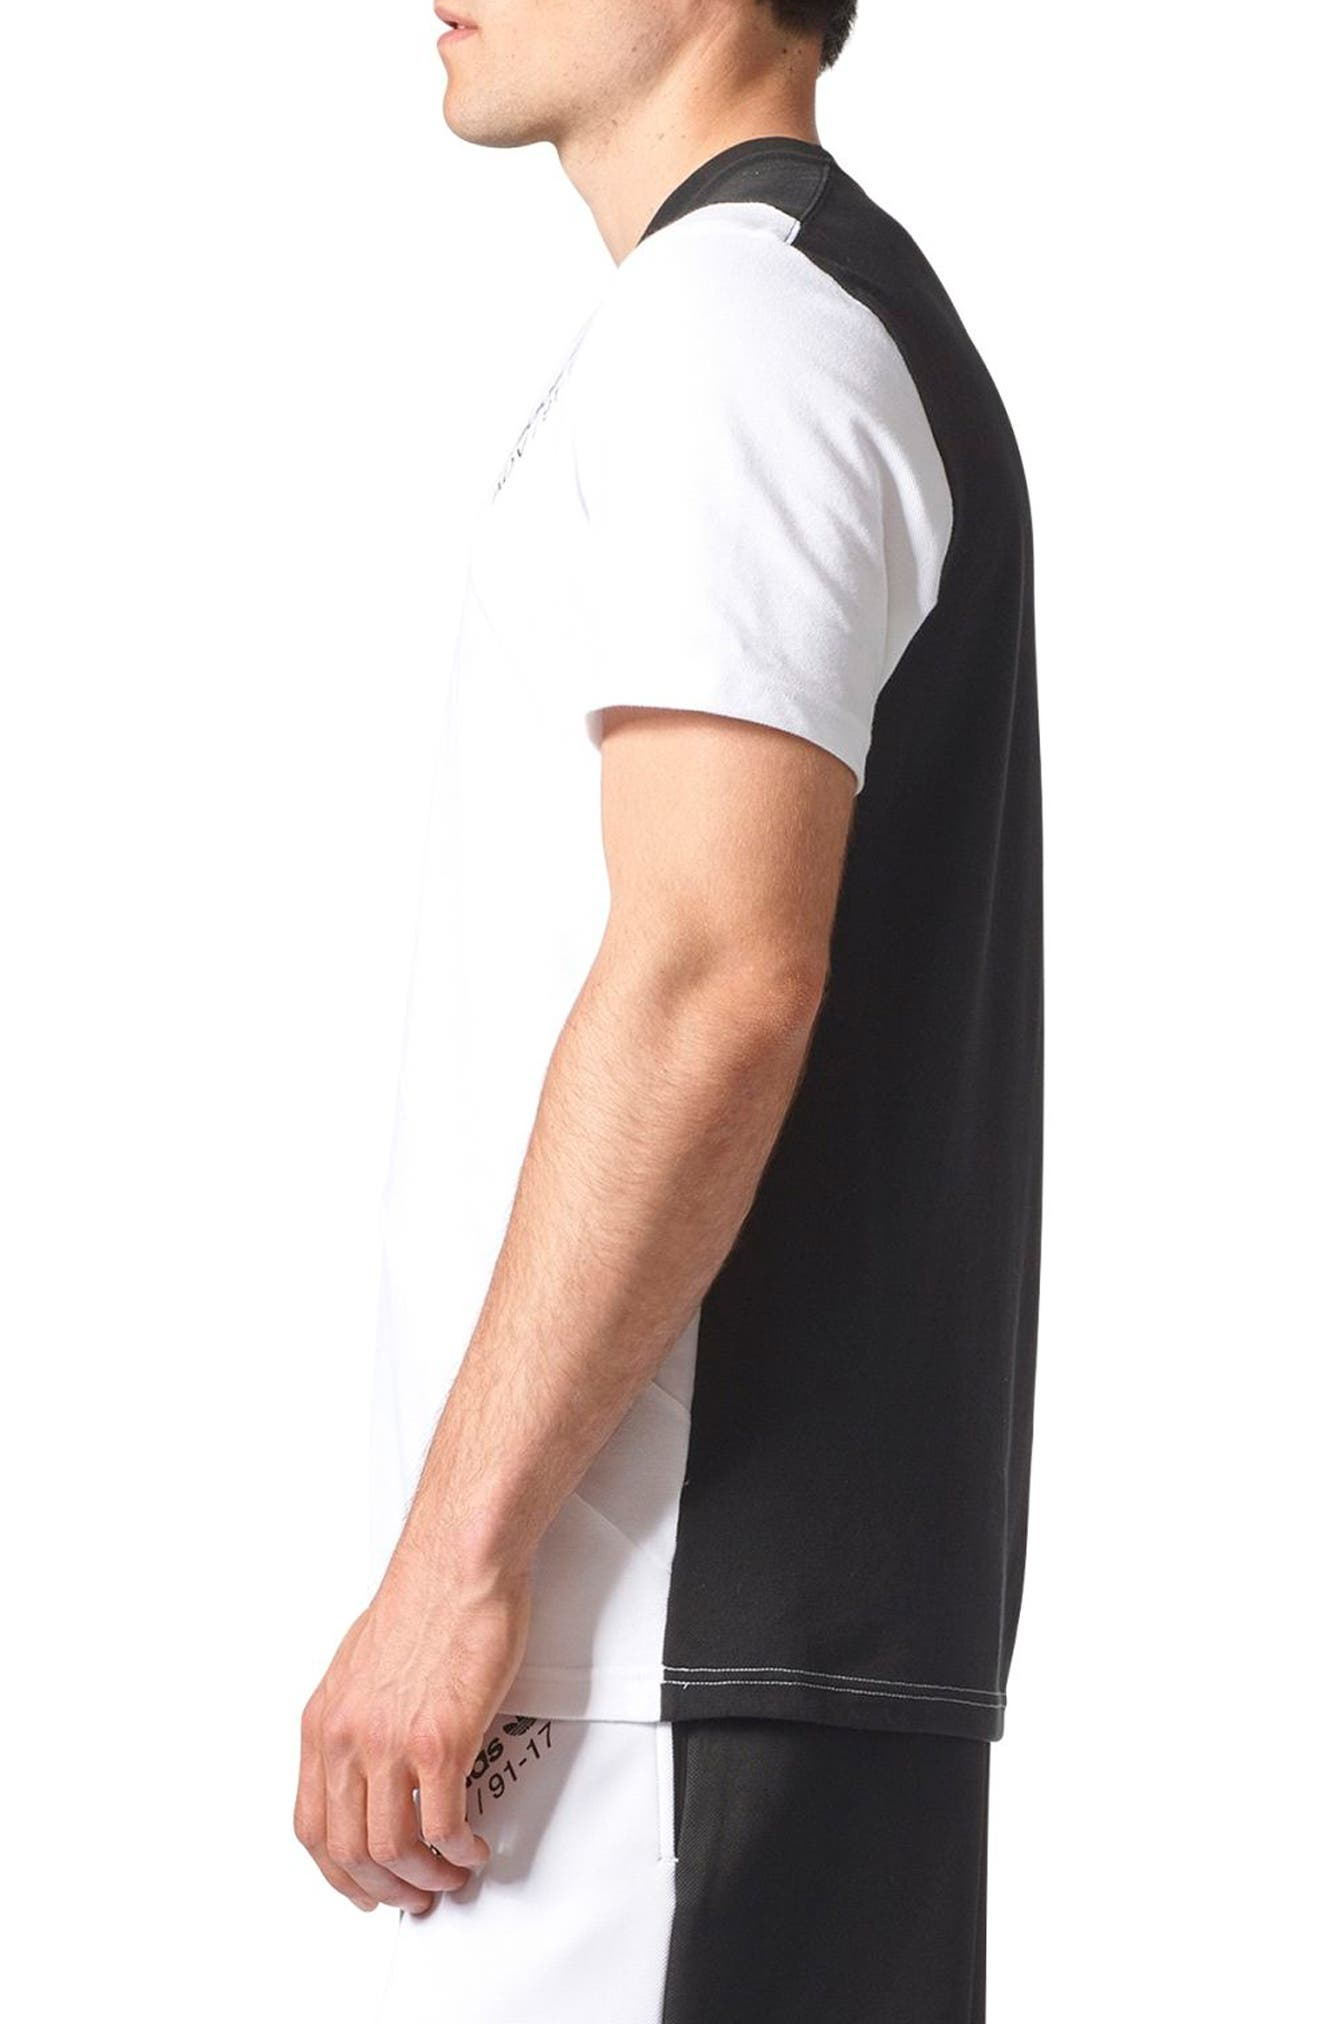 Equipment Rose City T-Shirt,                             Alternate thumbnail 3, color,                             001